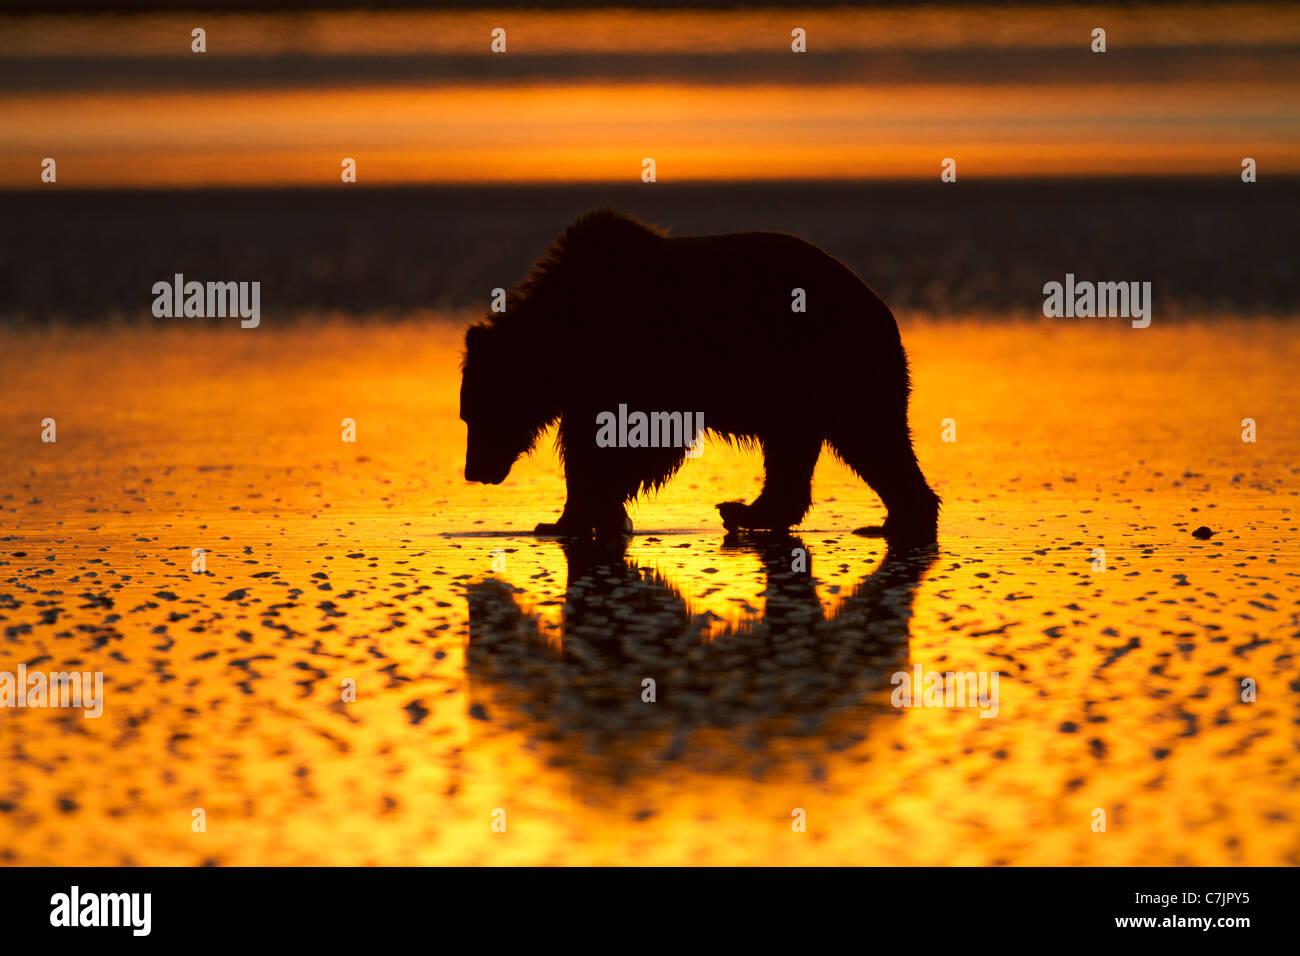 Marrón / Grizzly Bear buscando almejas al amanecer, Lake Clark National Park, Alaska. Imagen De Stock